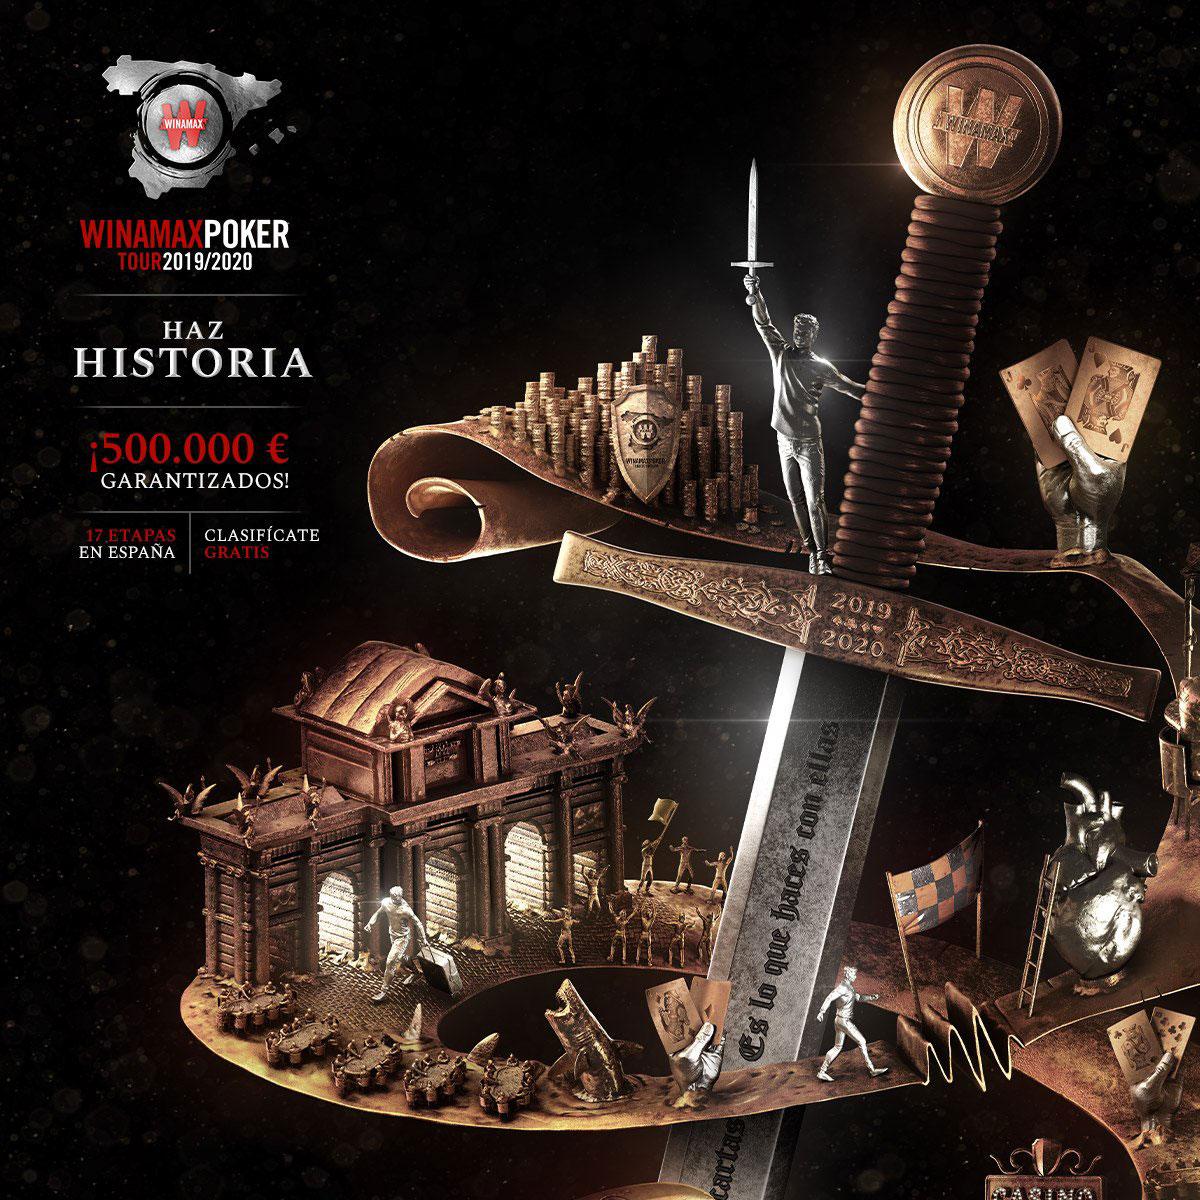 Winamax_Poker_Tour_banner_web